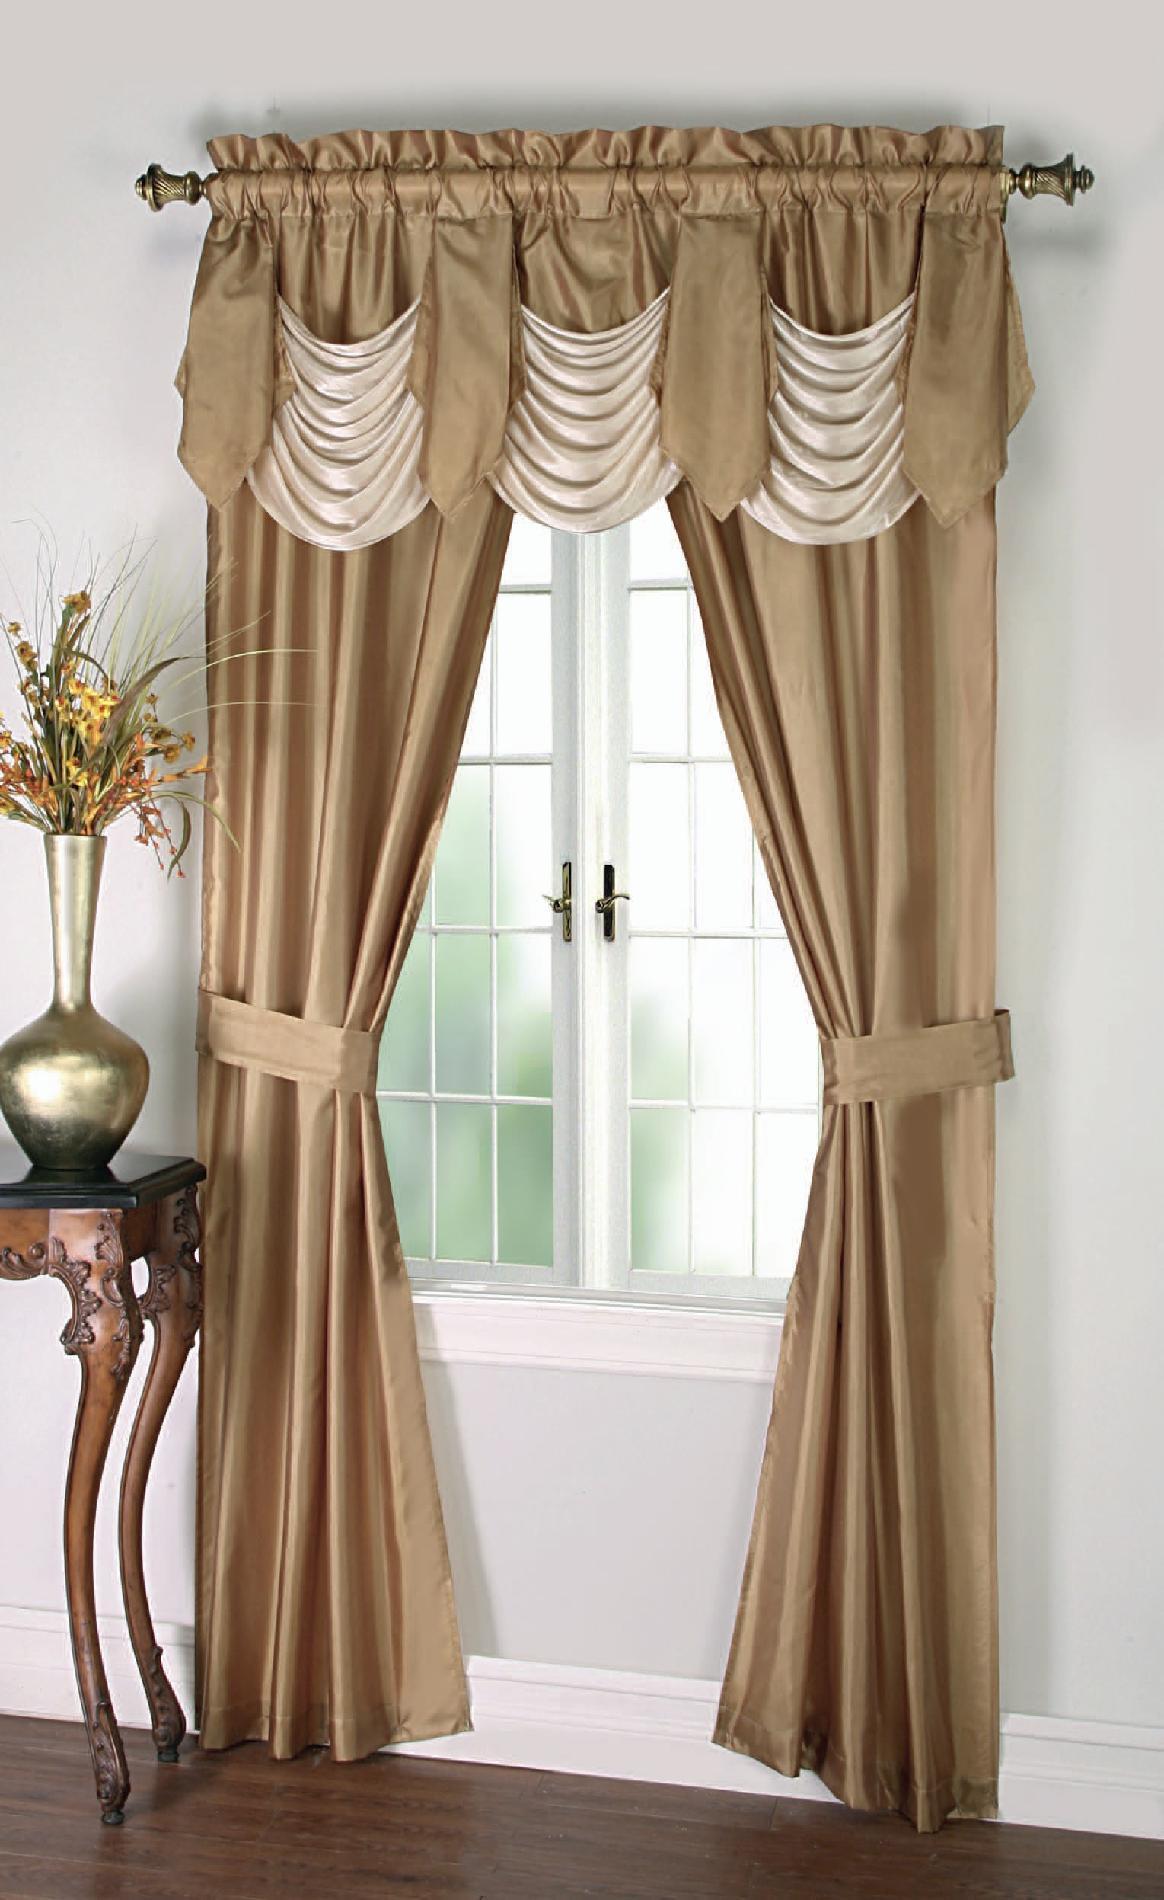 Cannon 5-Piece Curtain Panels, Valance & Tiebacks - Bellany